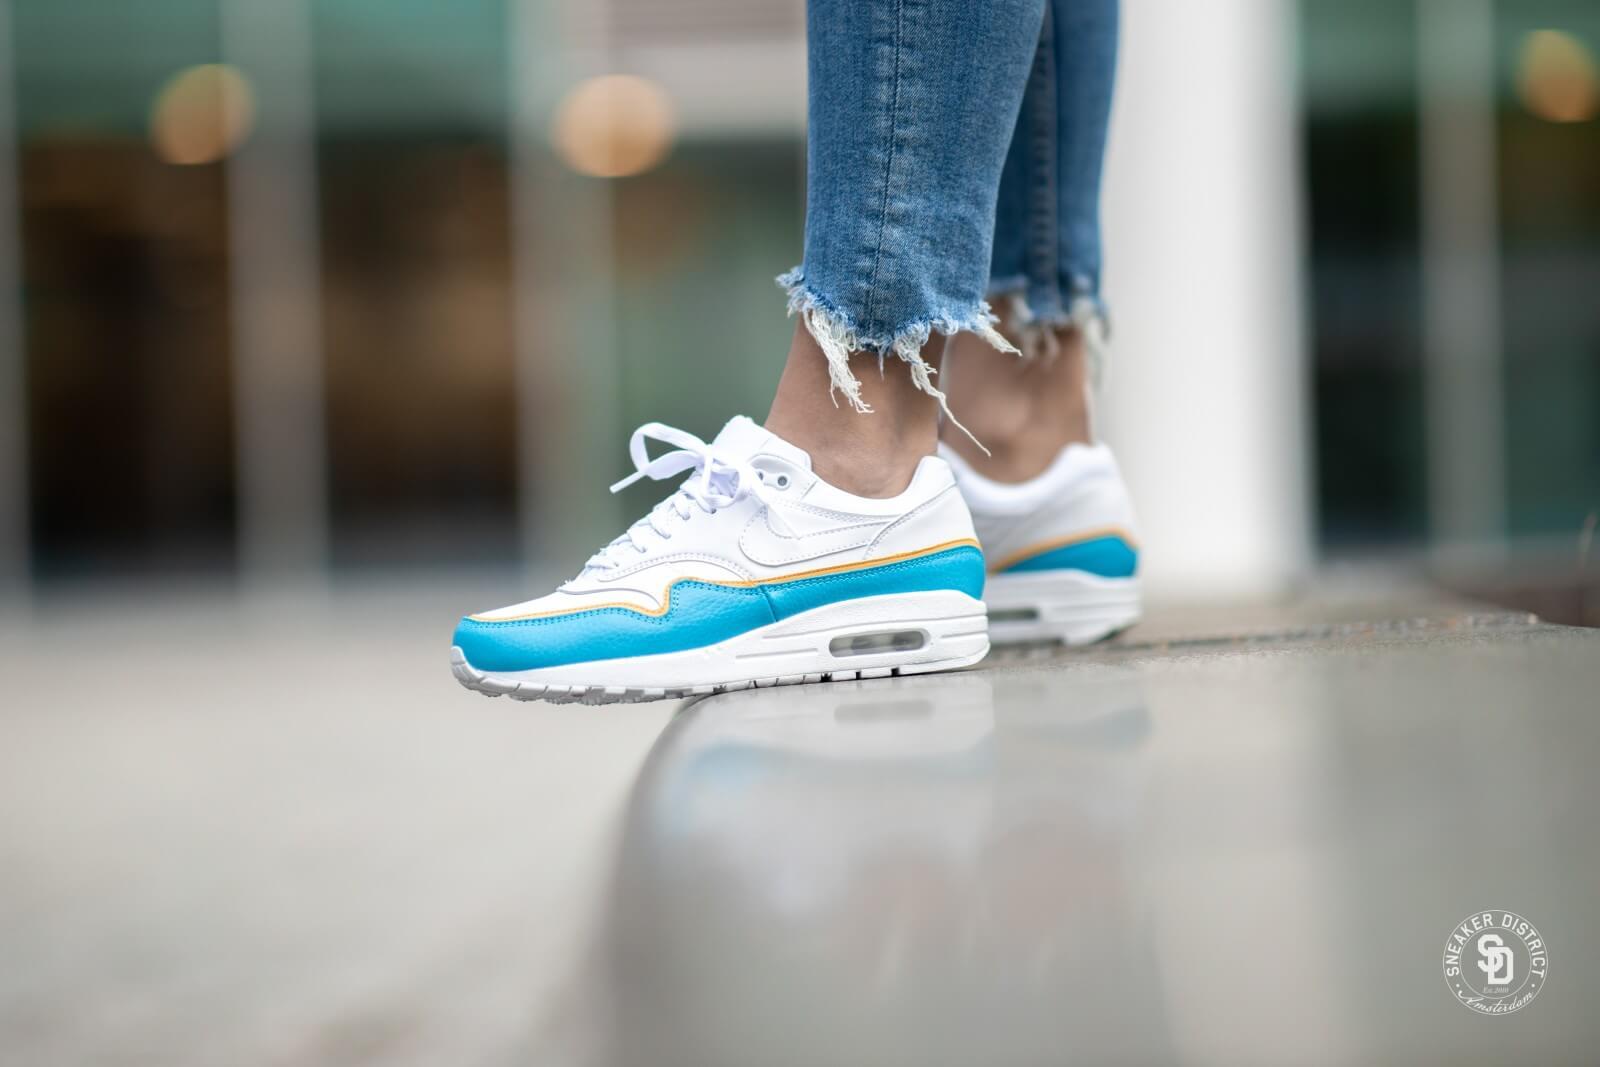 Nike Women's Air Max 1 SE White/LT Blue Fury - 881101-103